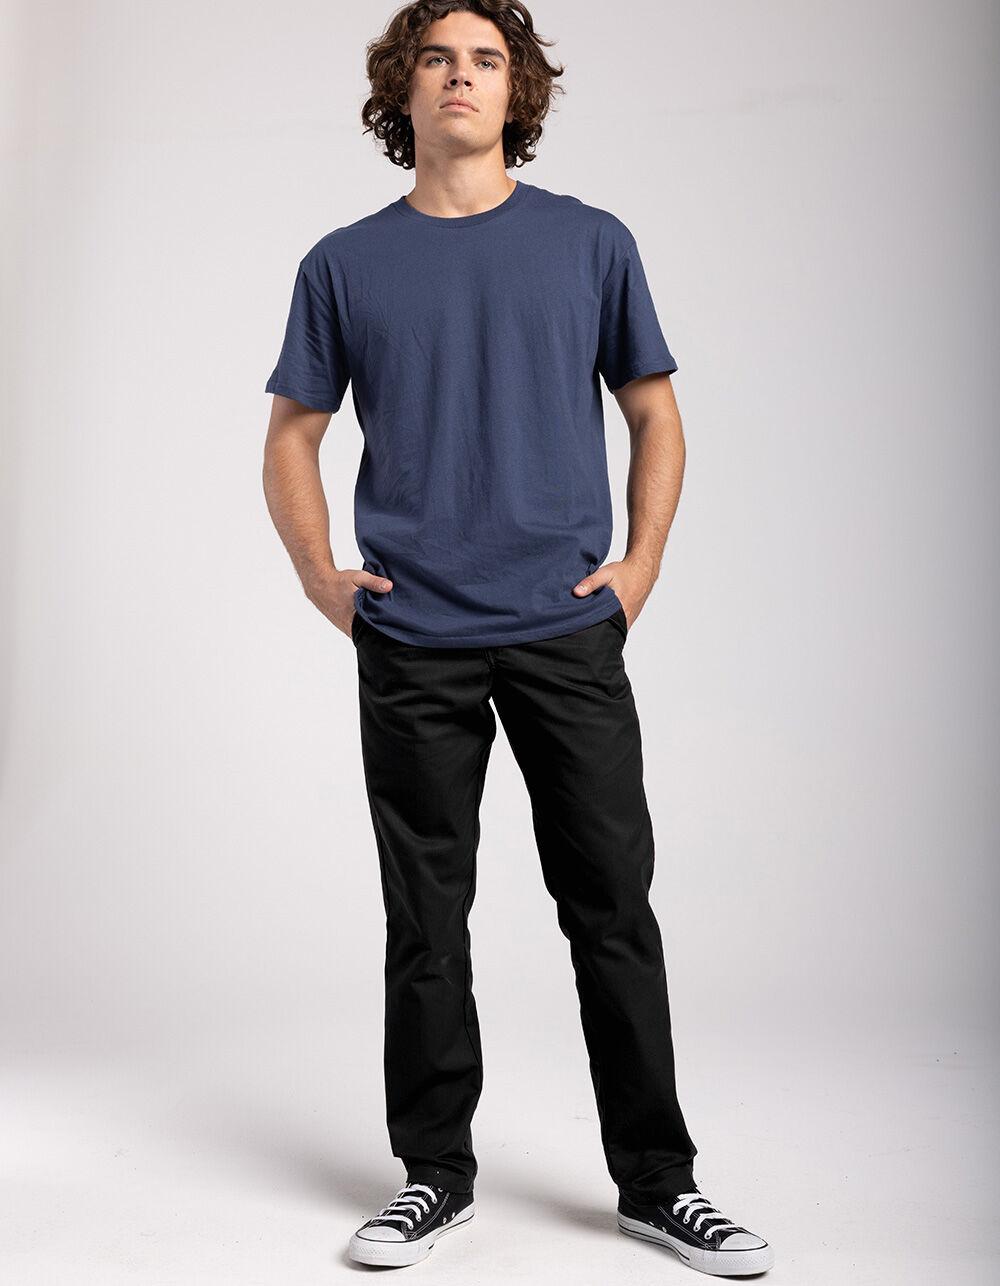 Image of DICKIES 850 SLIM TAPER FLEX BLACK PANTS